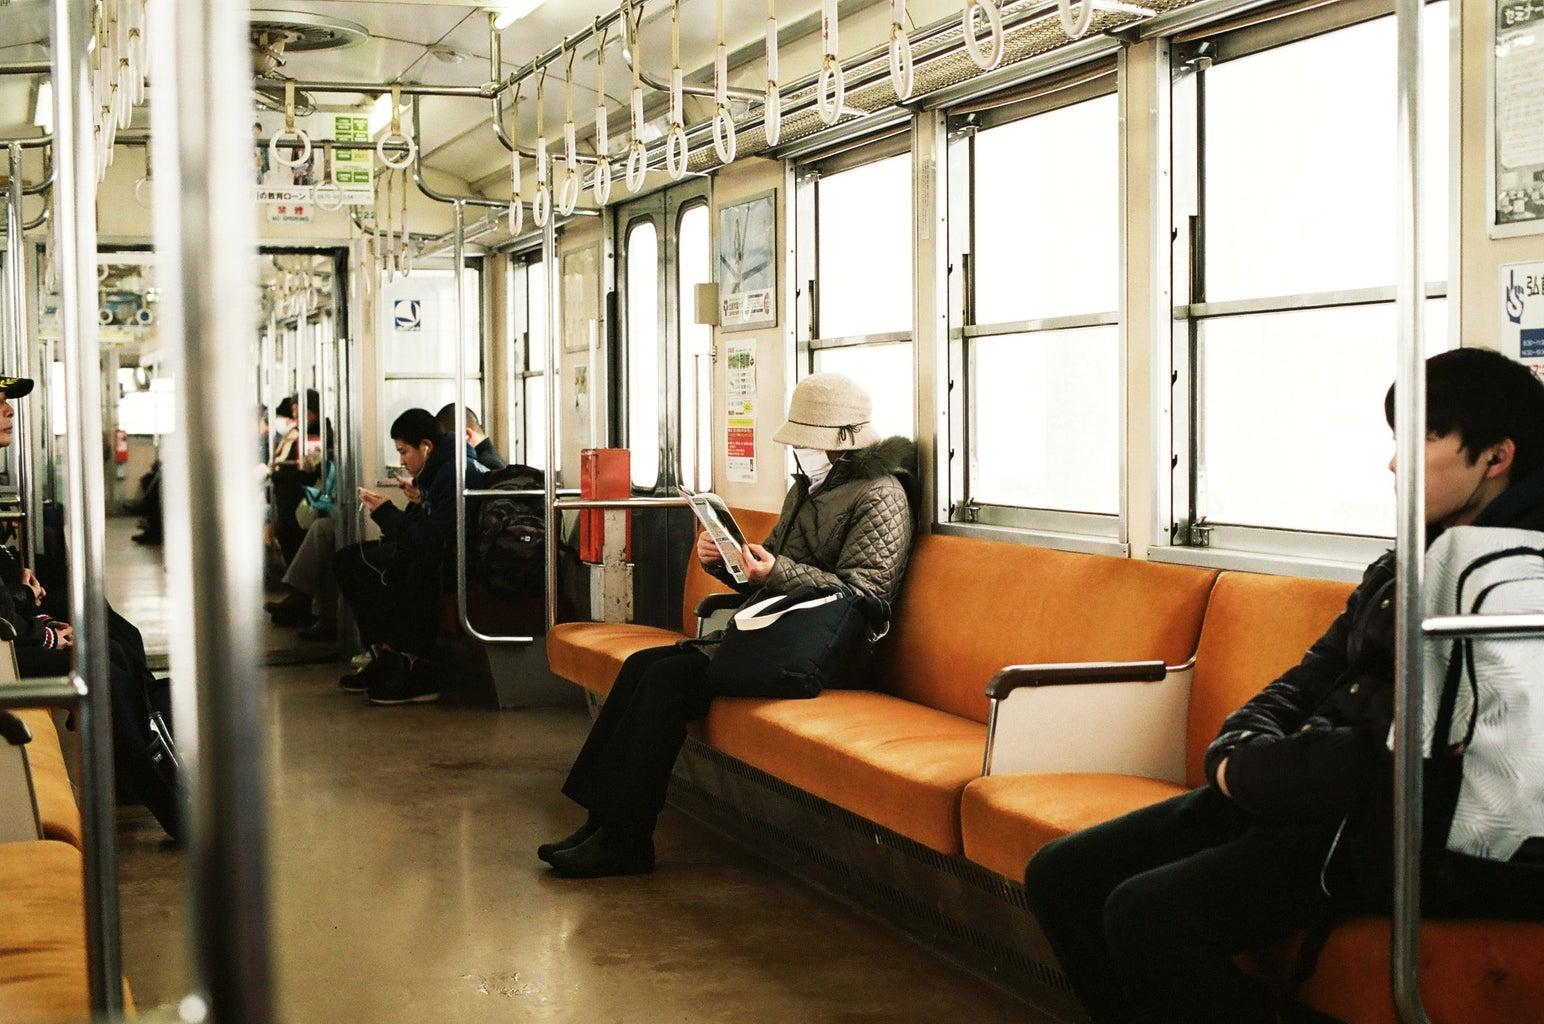 Masked person sitting on subway train car